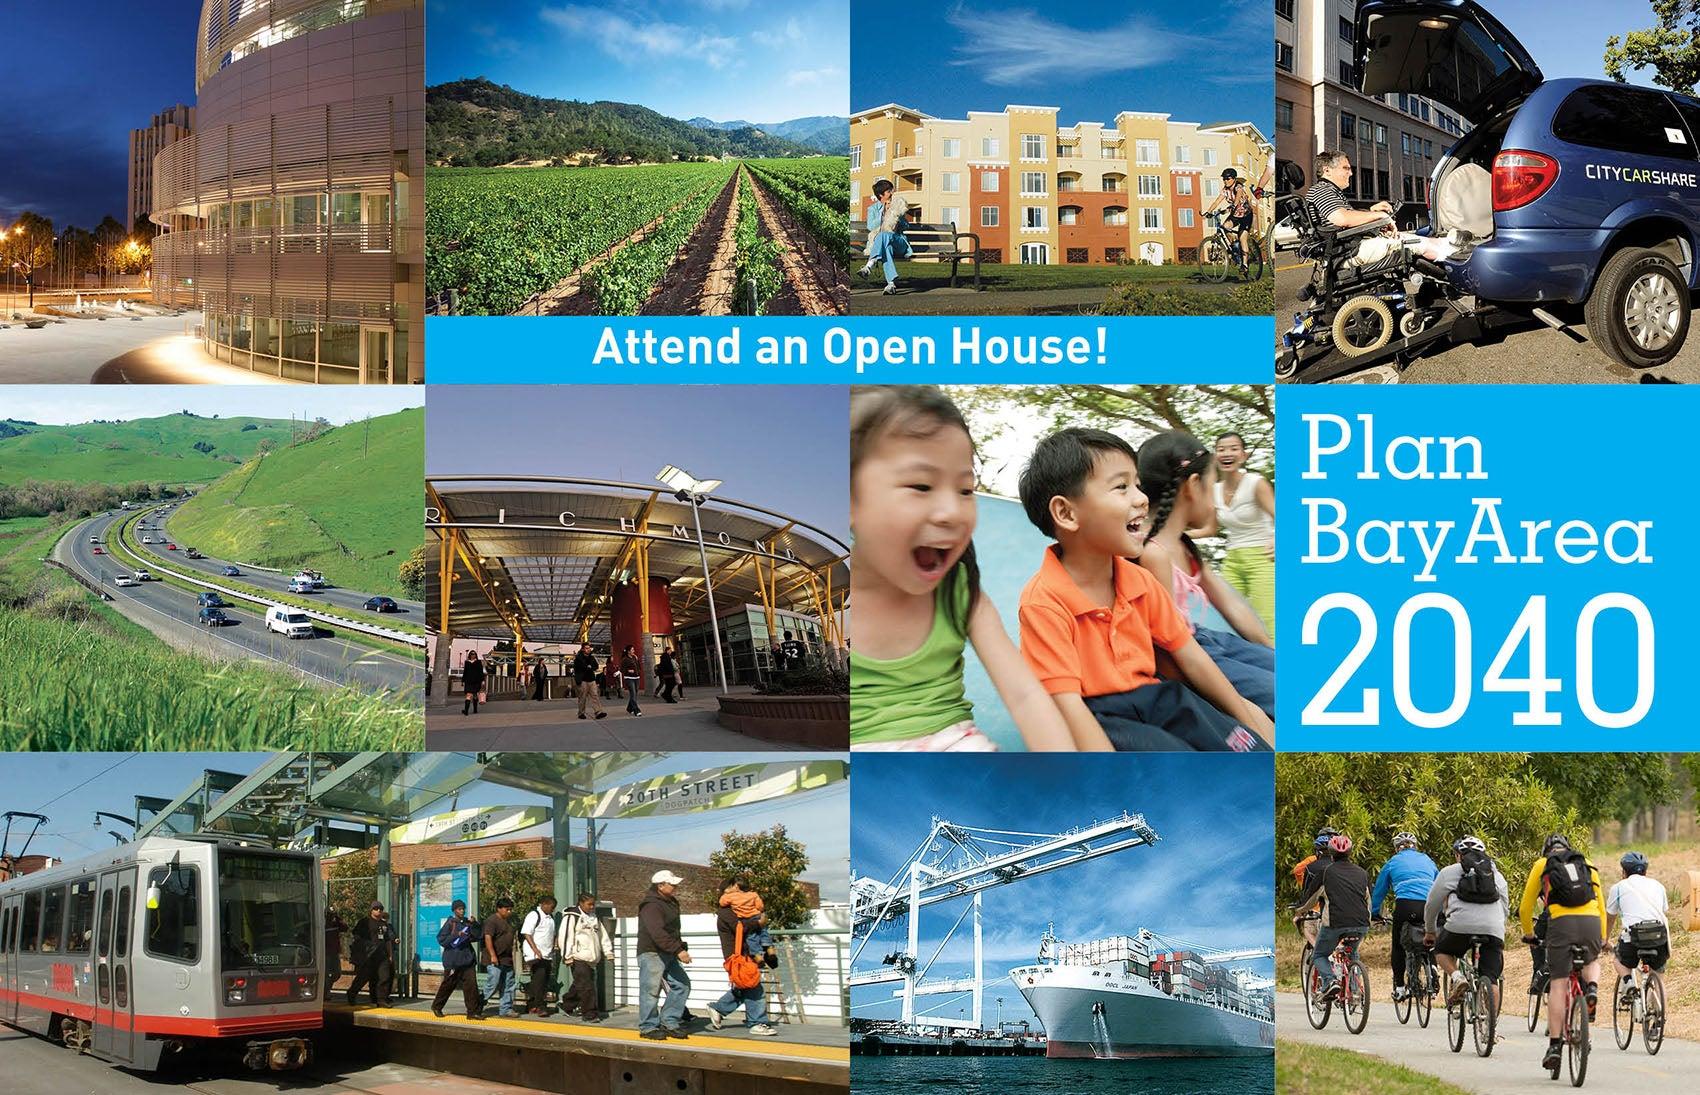 Plan Bay Area 2040